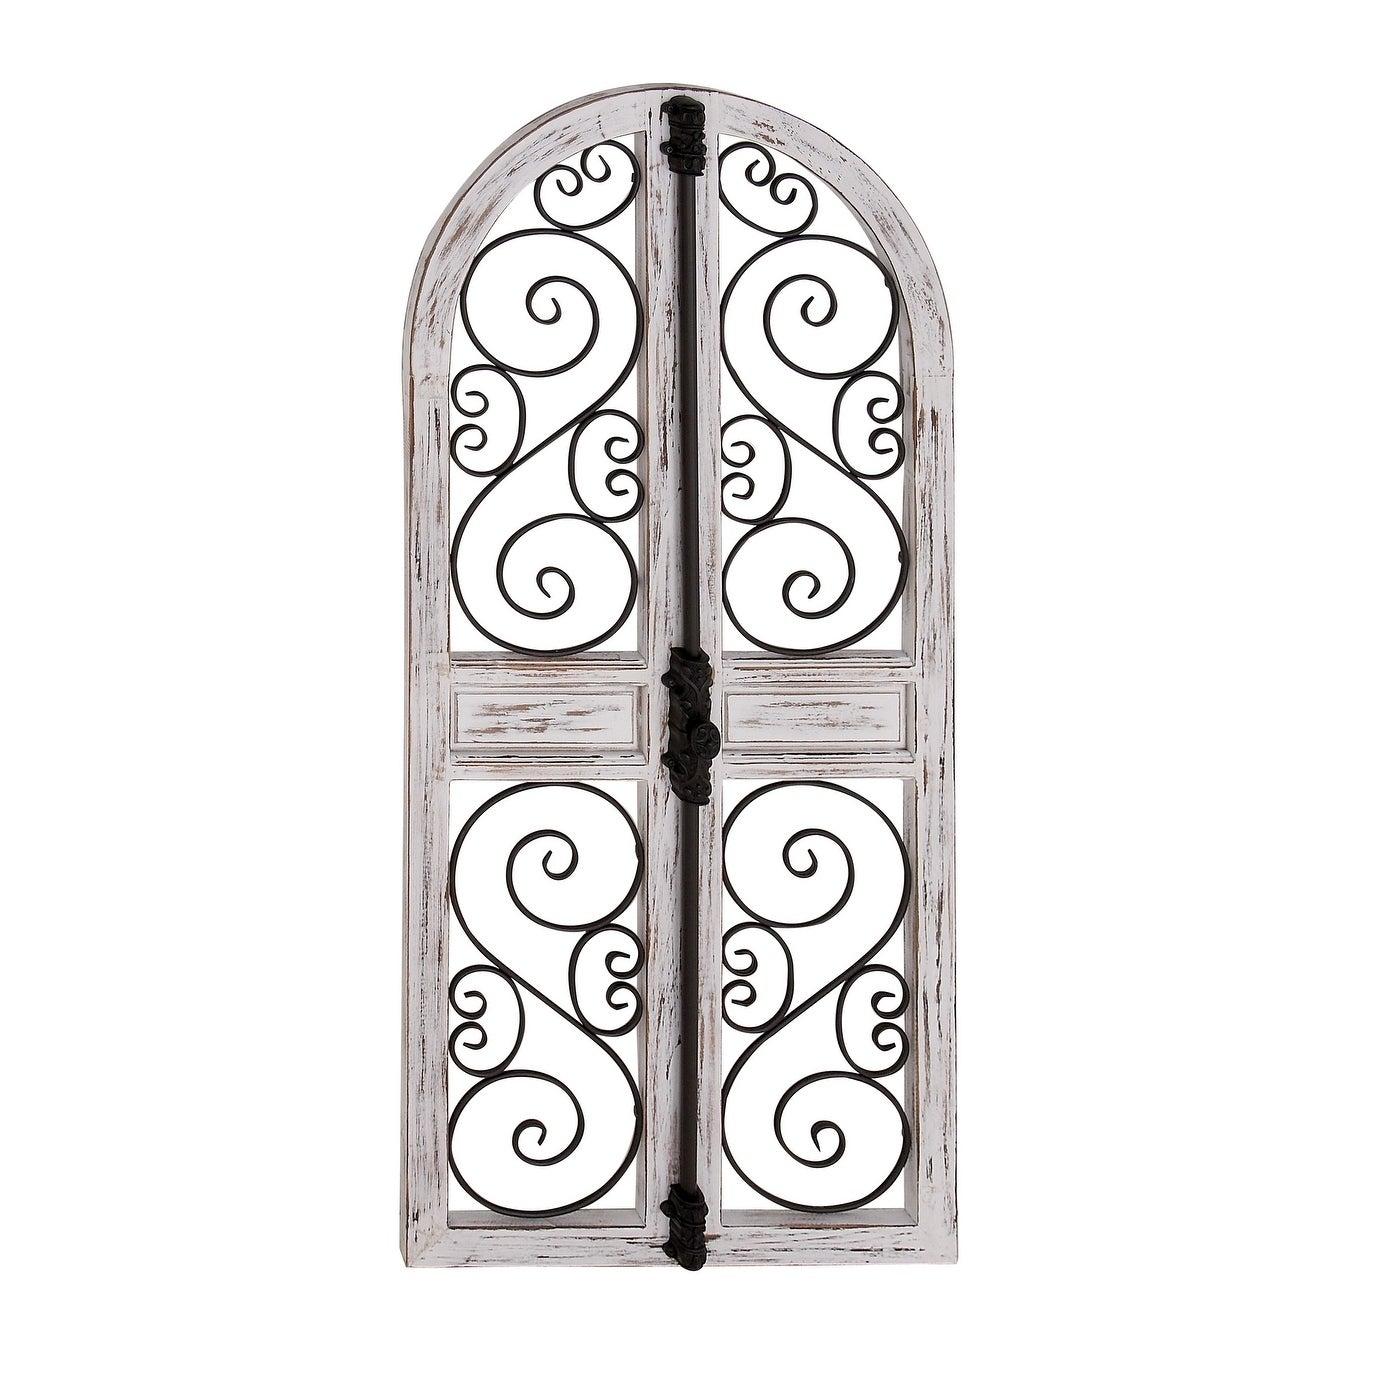 1383x1383 Shop Farmhouse X Inch Wood And Iron Door Style Wall Decor